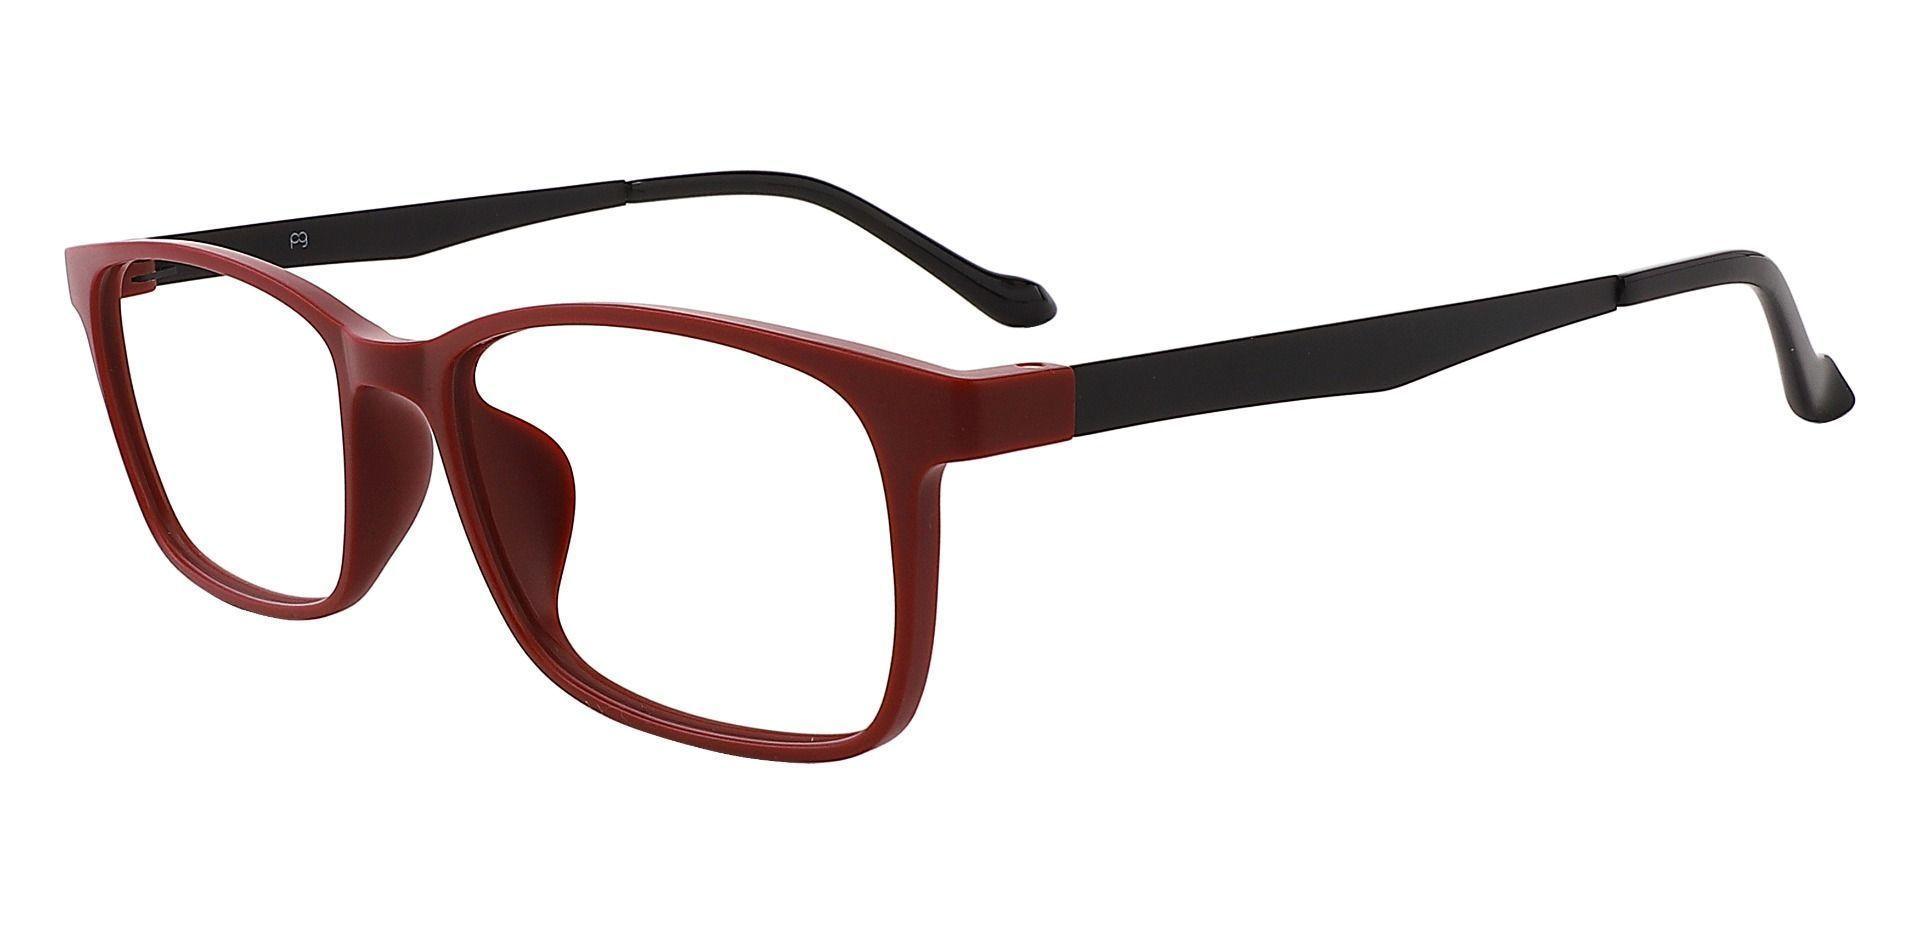 Palmetto Rectangle Reading Glasses - Red